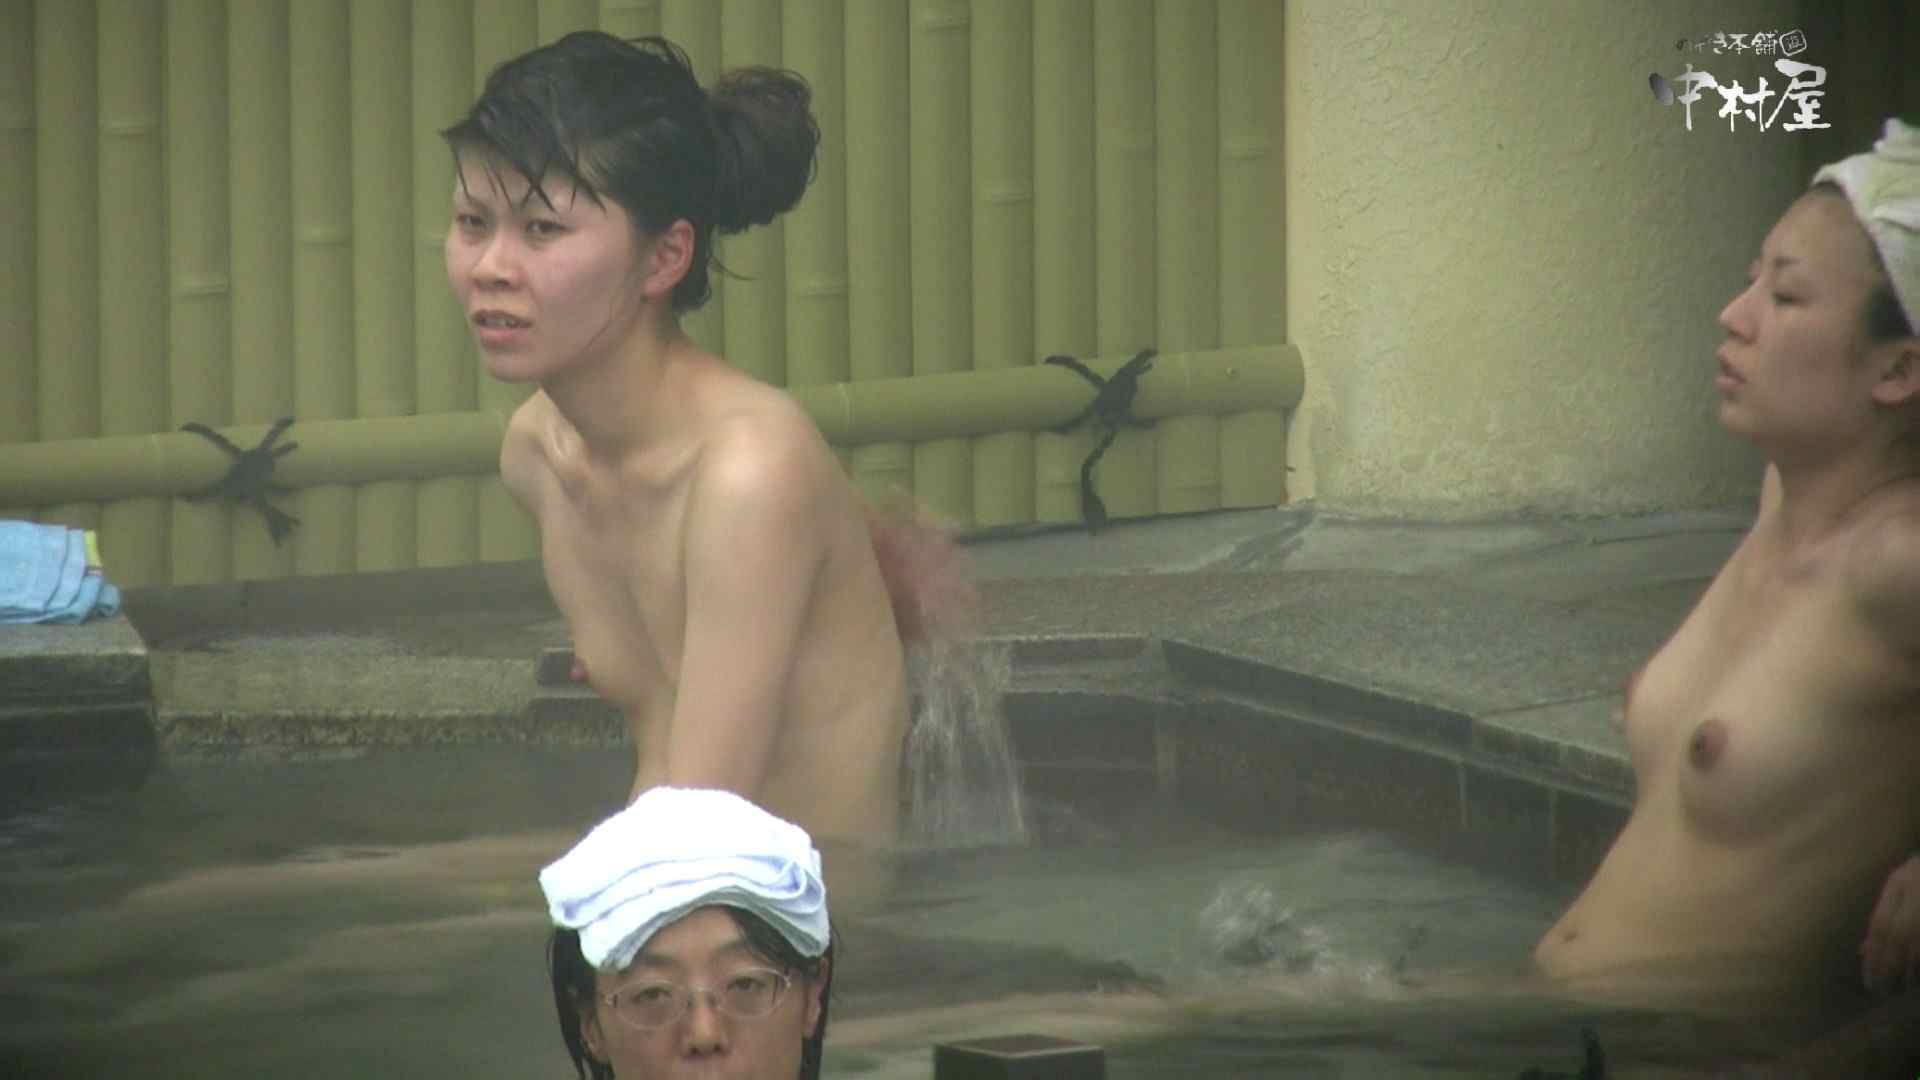 Aquaな露天風呂Vol.890 0   0  85連発 37